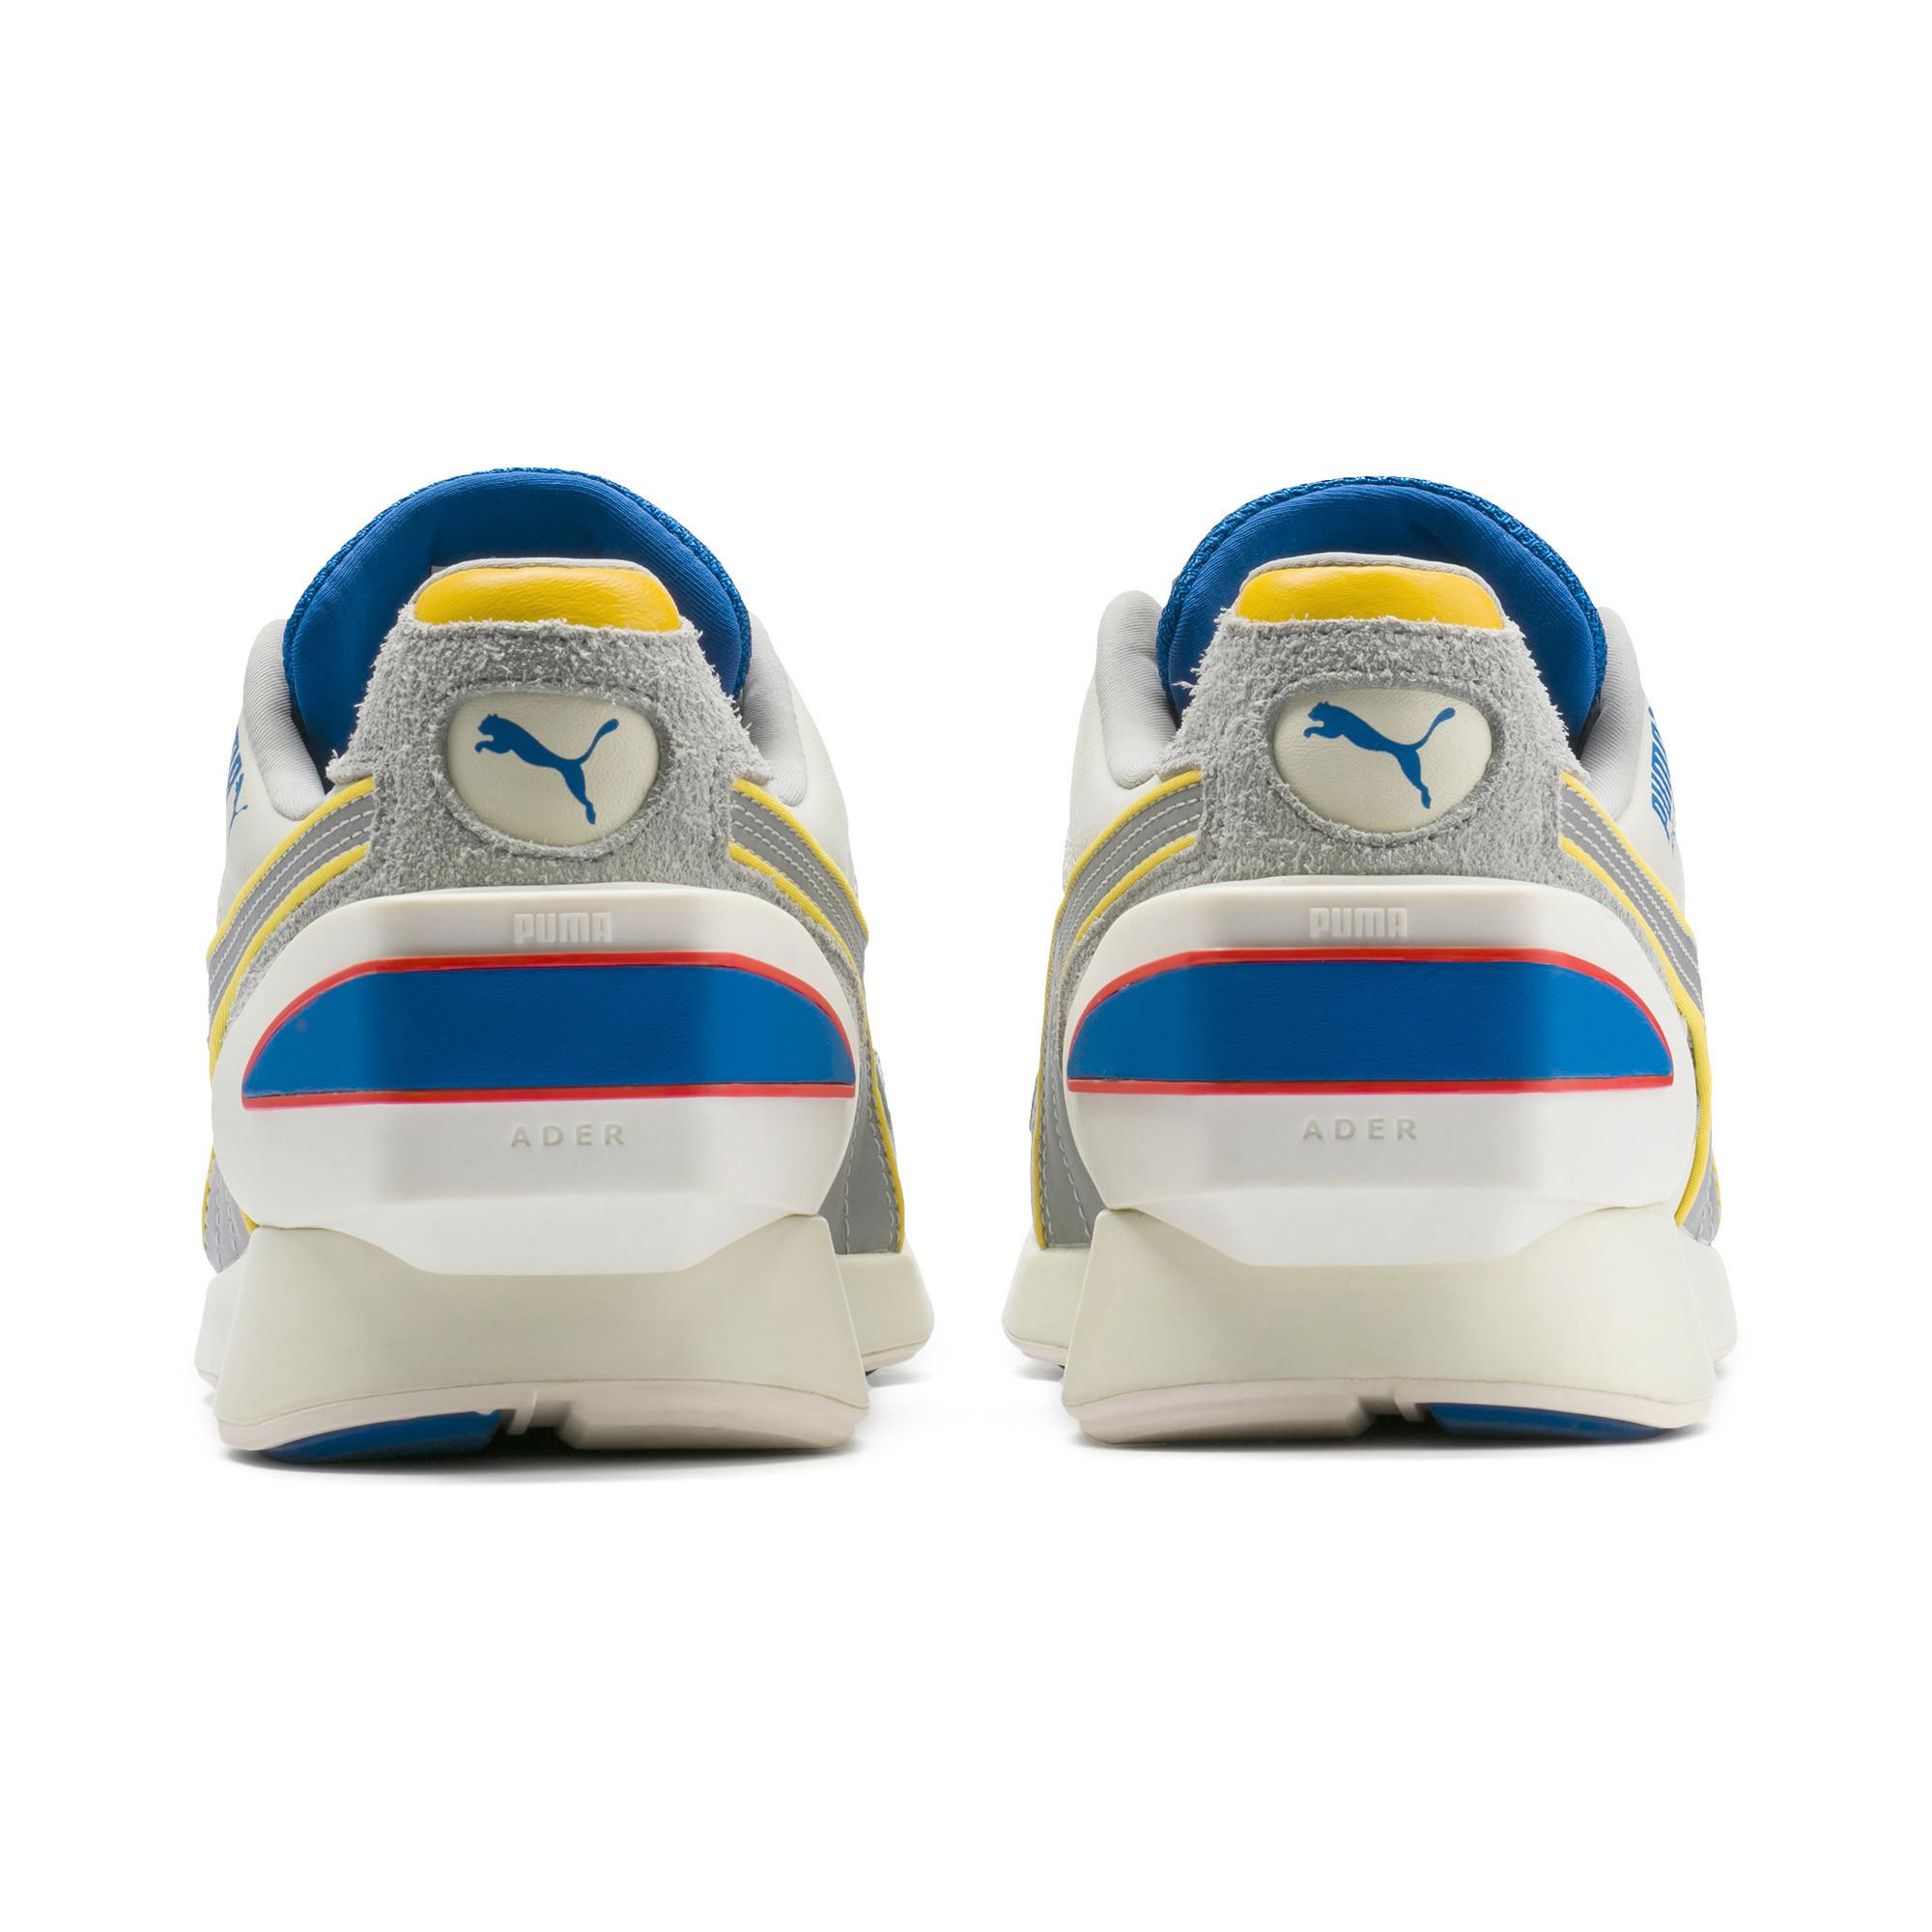 Lyst - PUMA X Ader Error Rs-100 Sneakers 265106f25